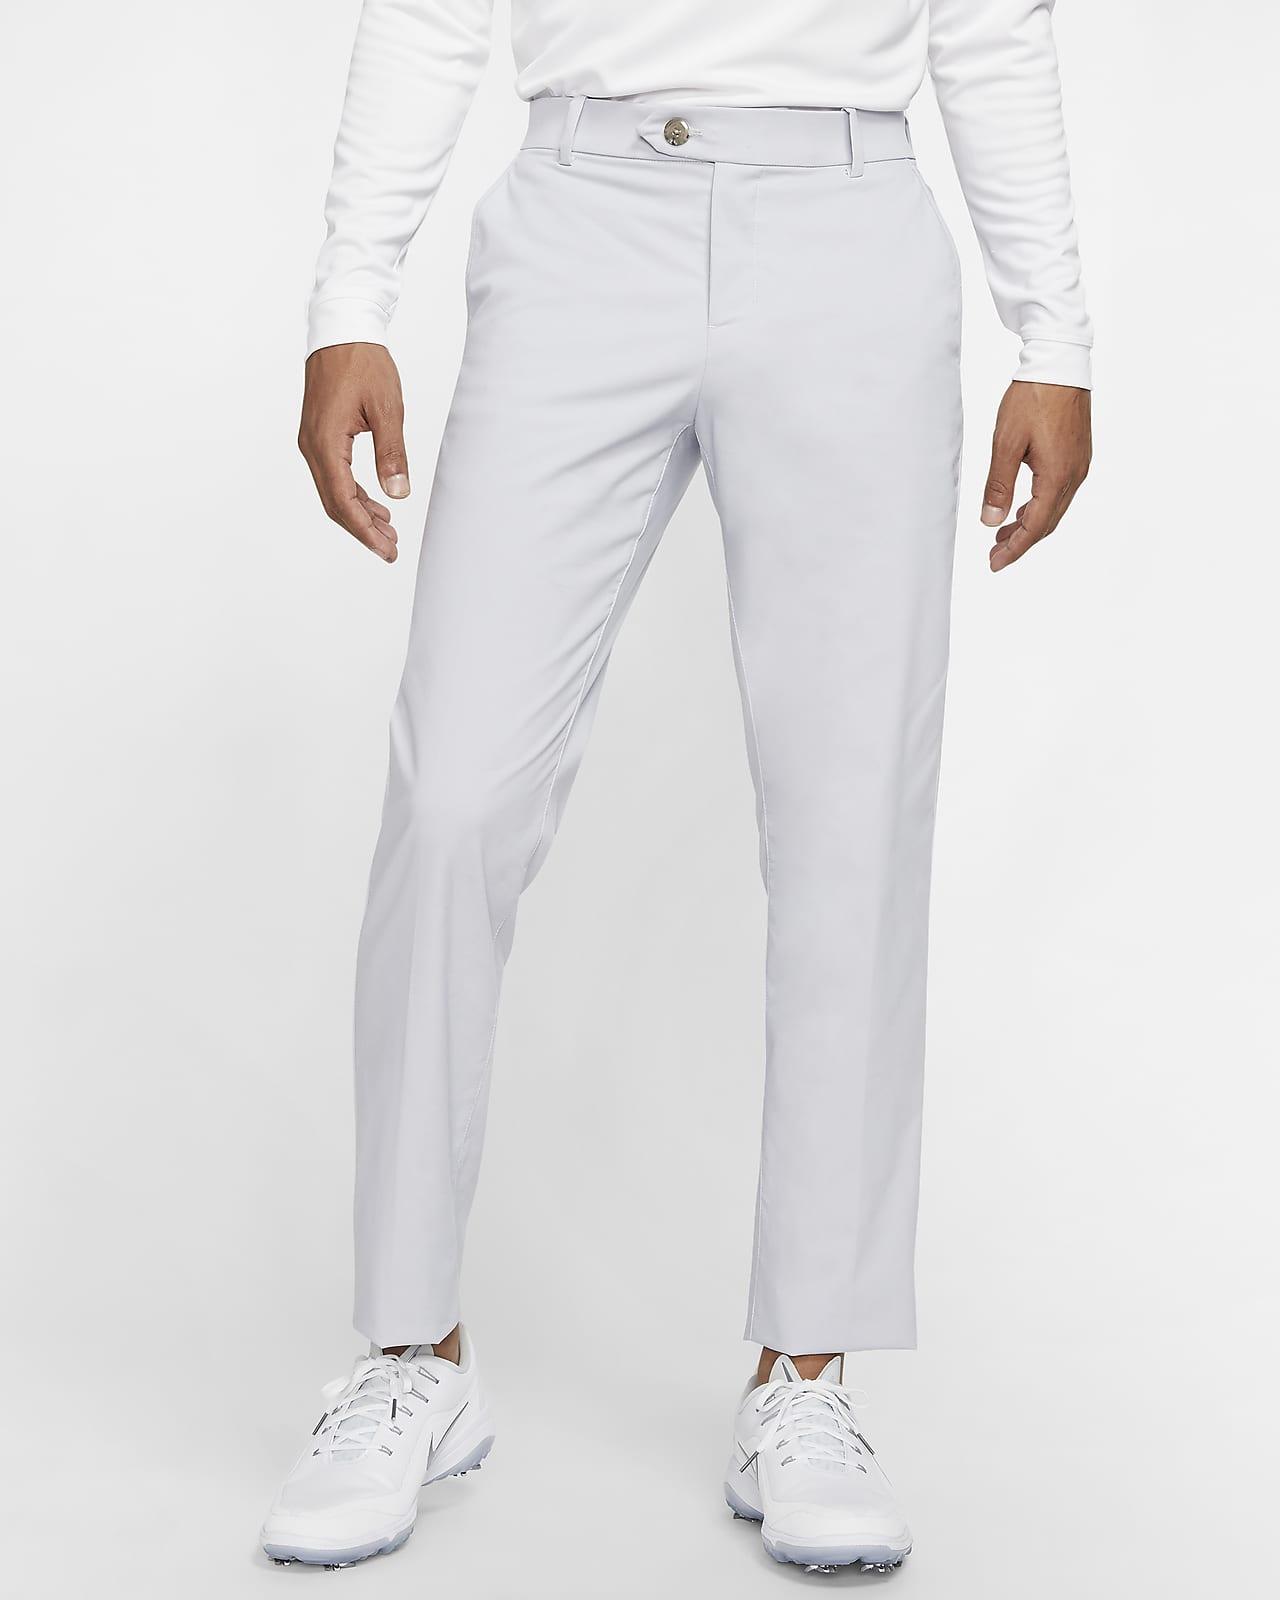 Nike Flex Player Men's Golf Trousers